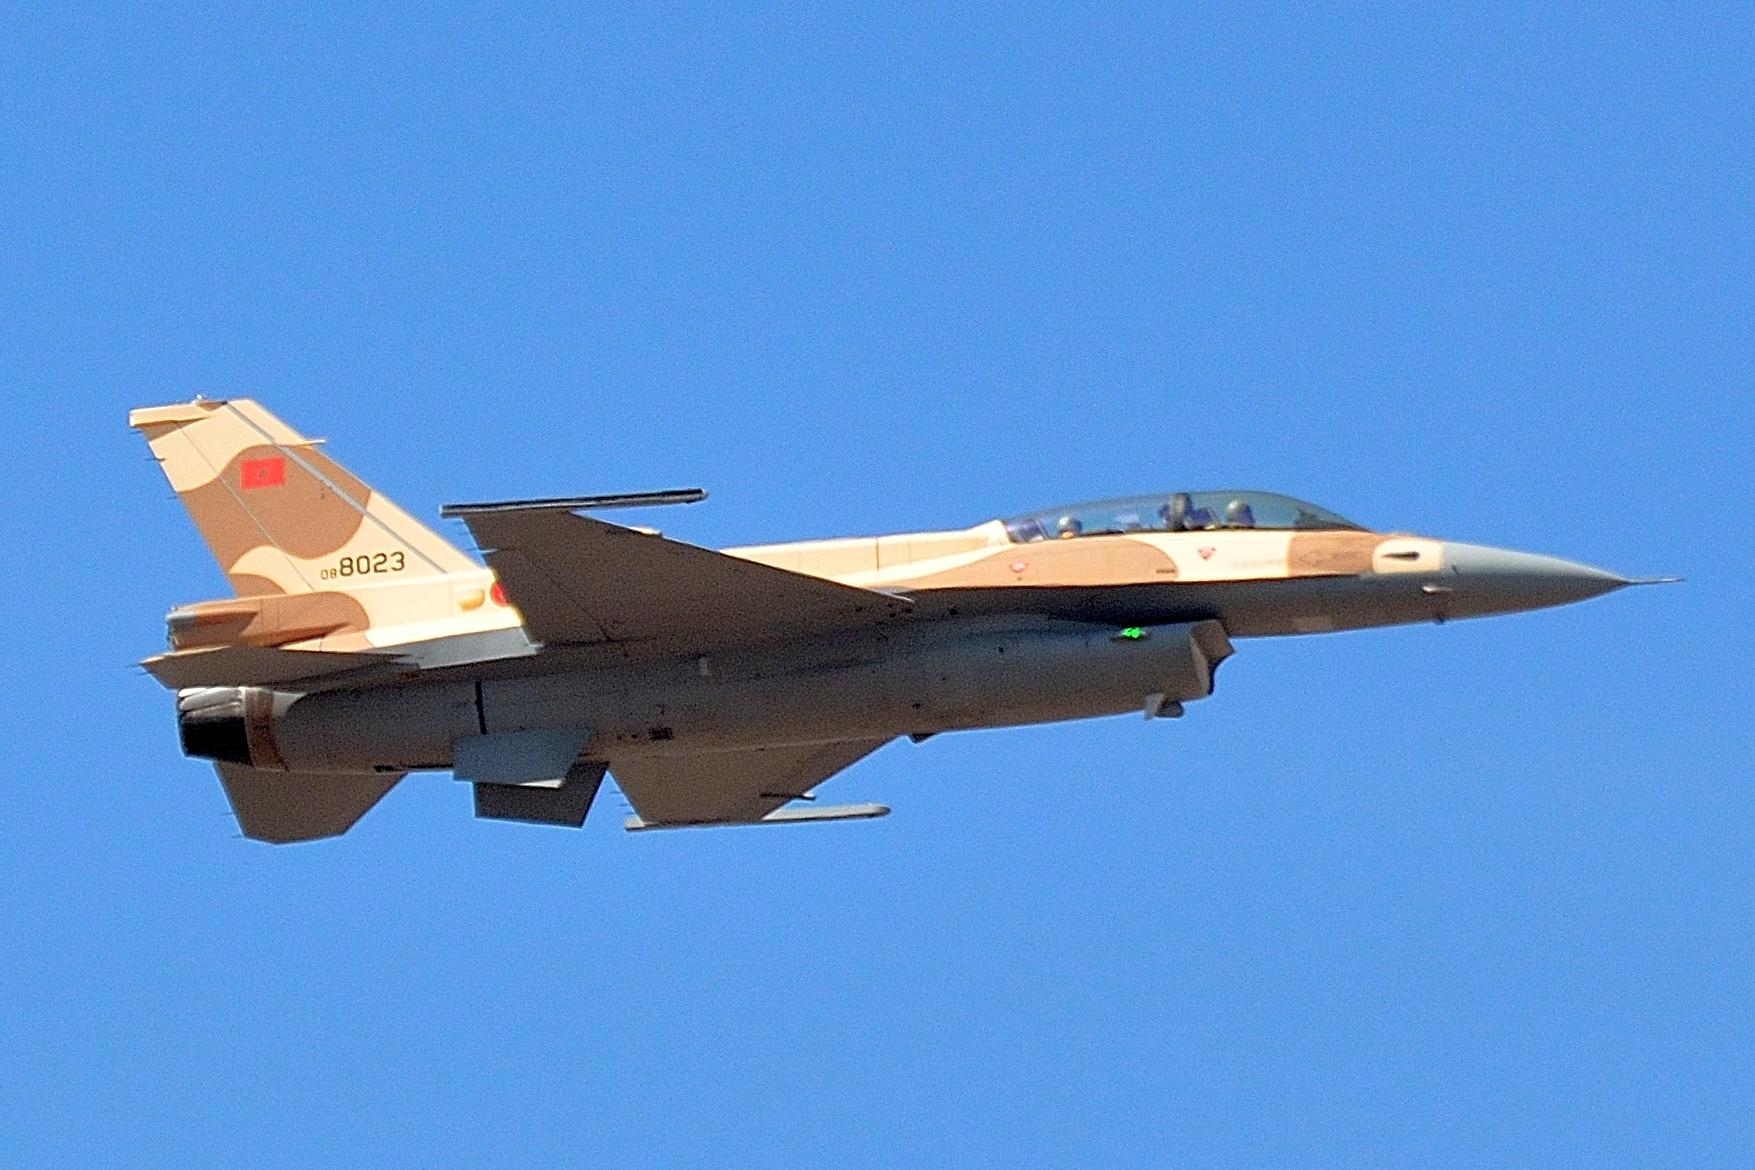 Moroccan F-16 Atlas Falcon / RMAF F16 block 52+ - Page 31 32173530810_f05f18bbfc_o